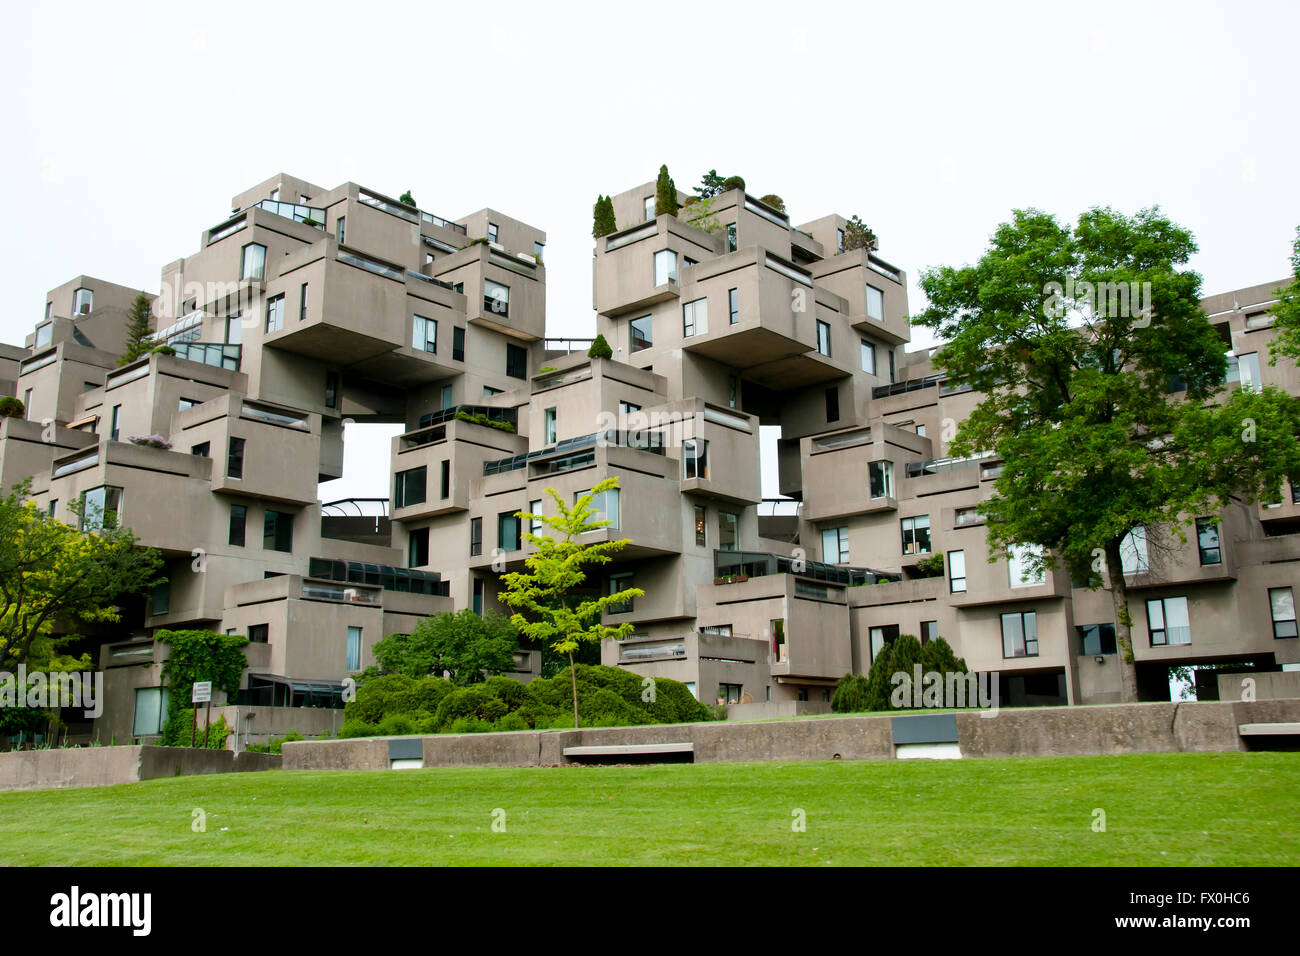 Public Apartments - Montreal - Canada - Stock Image